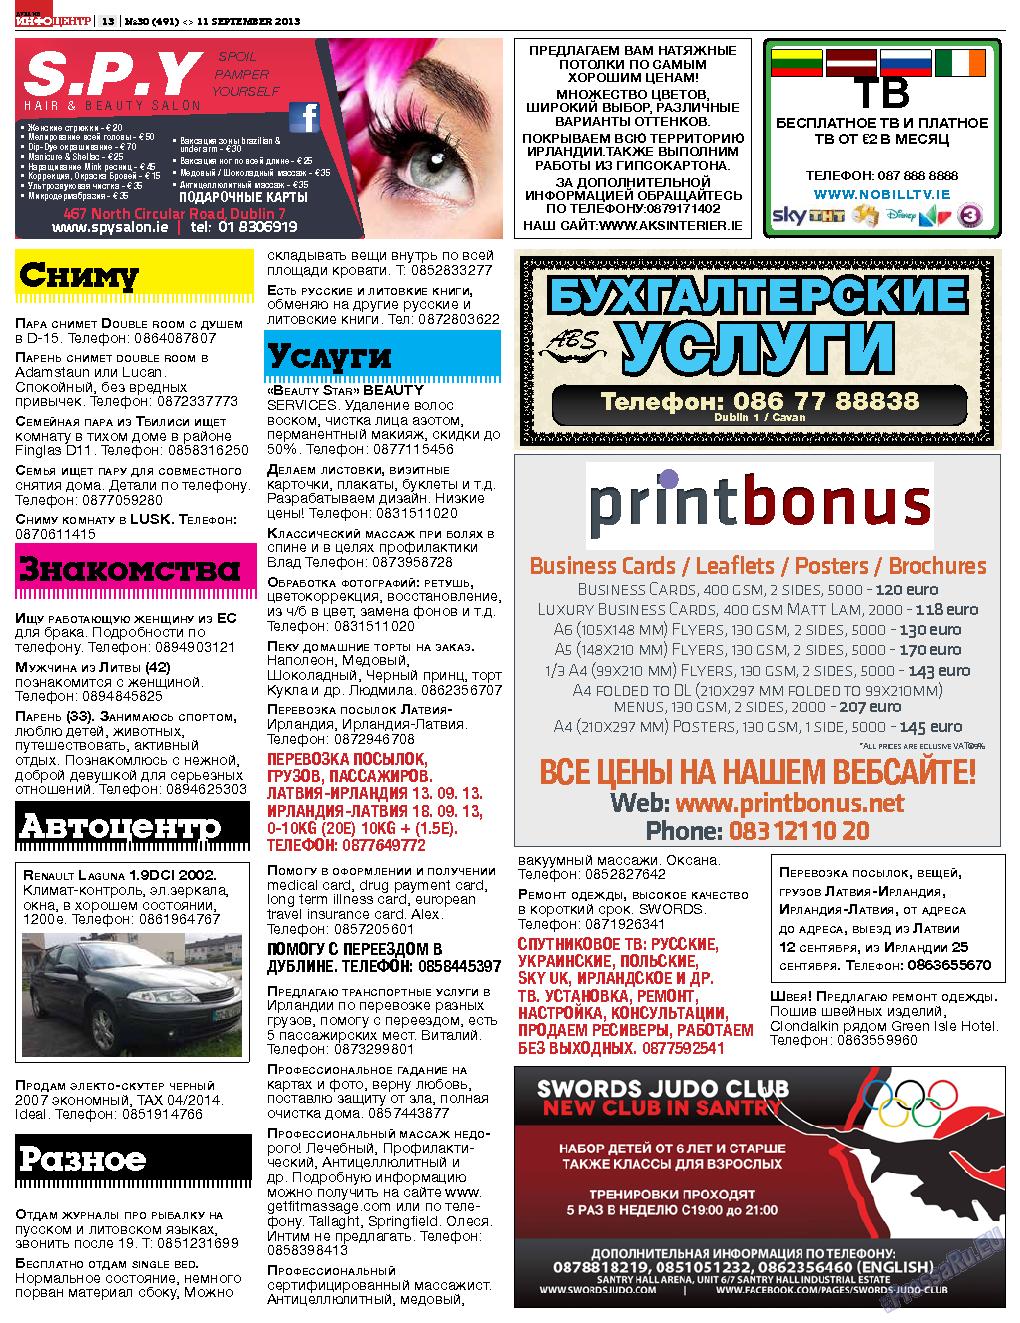 Дублин инфоцентр (газета). 2013 год, номер 30, стр. 13